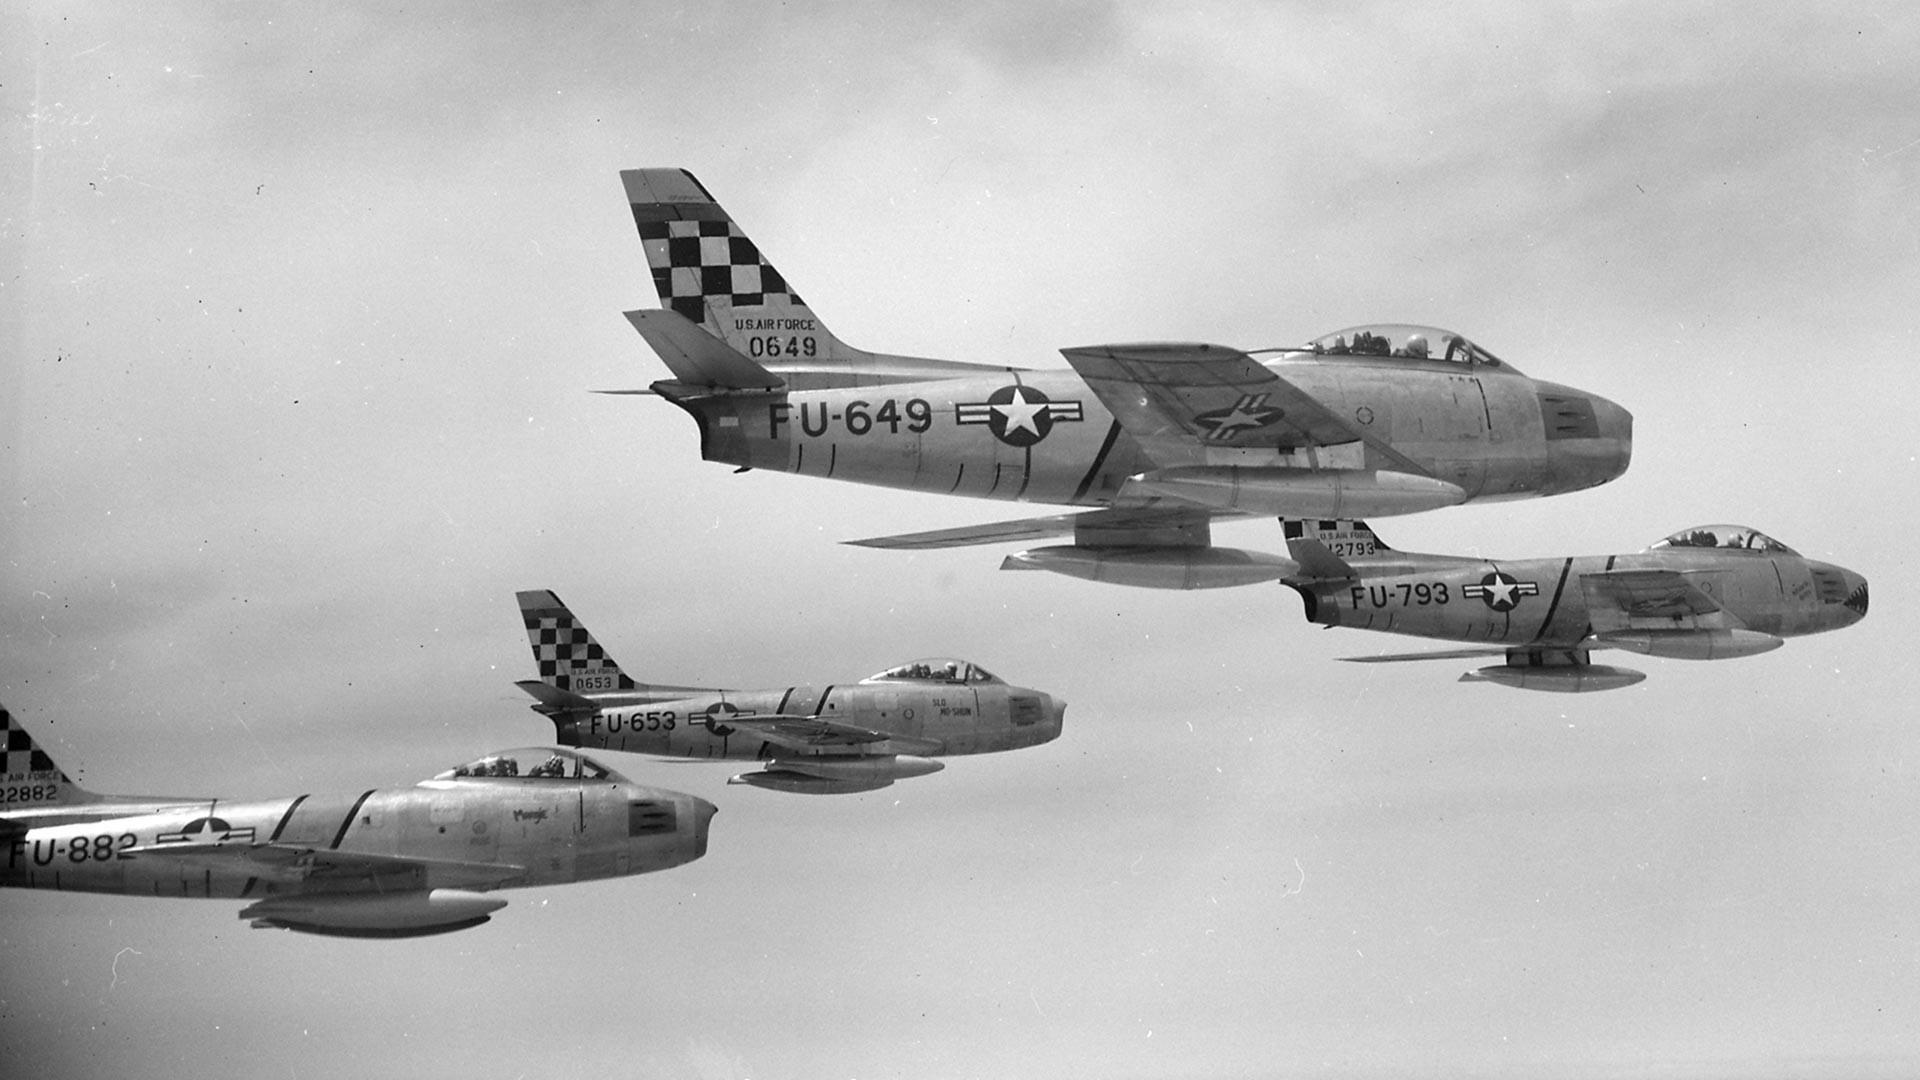 Vier F-86E-Sabre-Jagdflugzeuge der 51. US-Abfangjäger-Staffel über Korea am 22. Mai 1953.